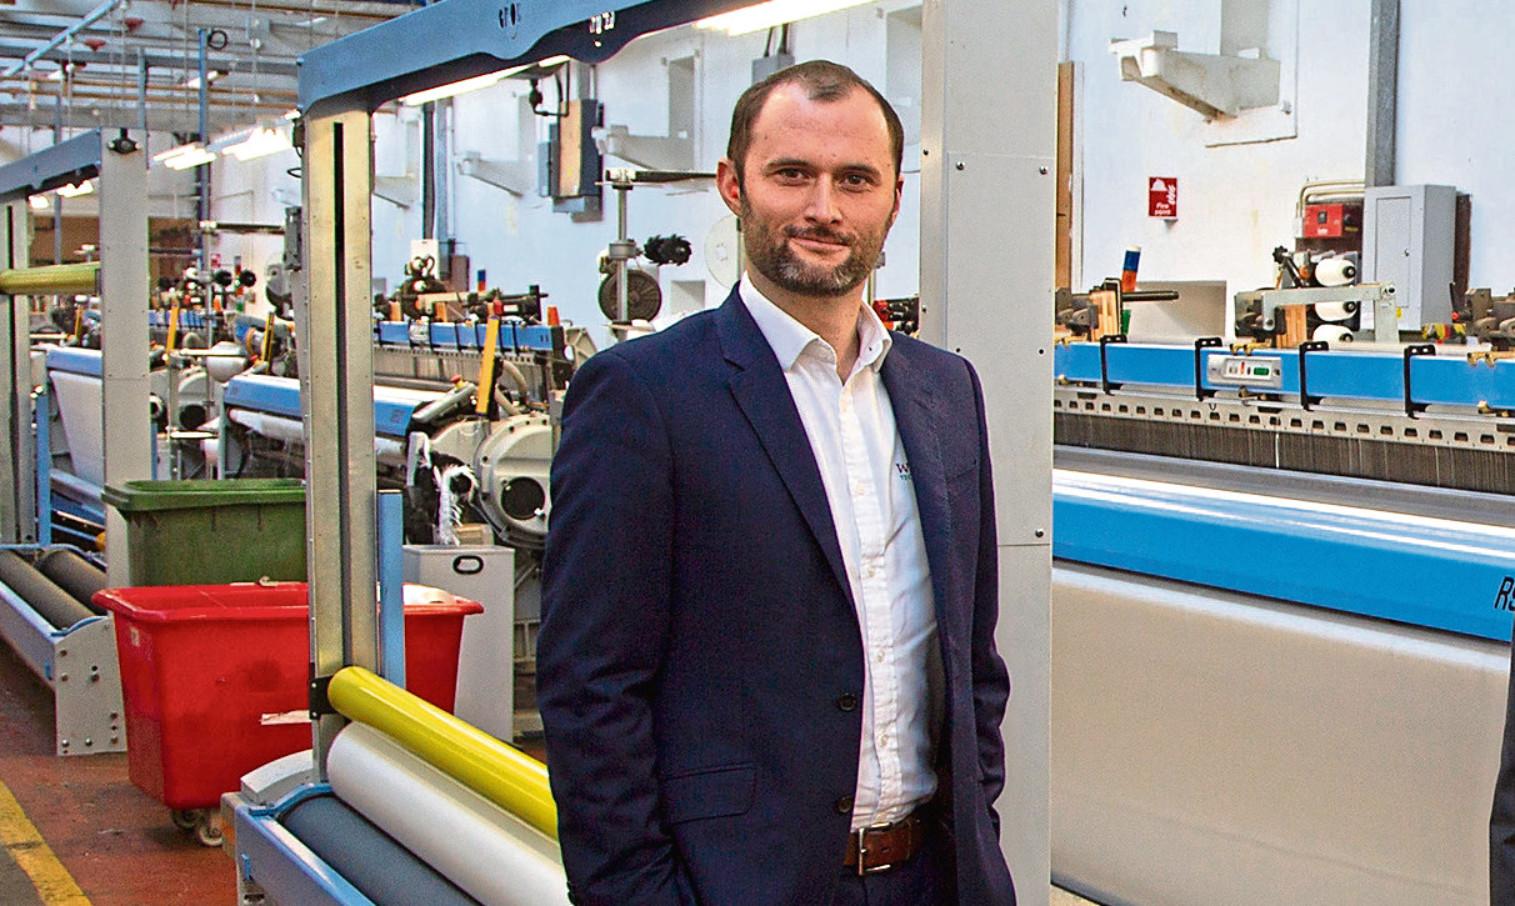 Jean-Christophe Granier, co-managing director of J&D Wilkie